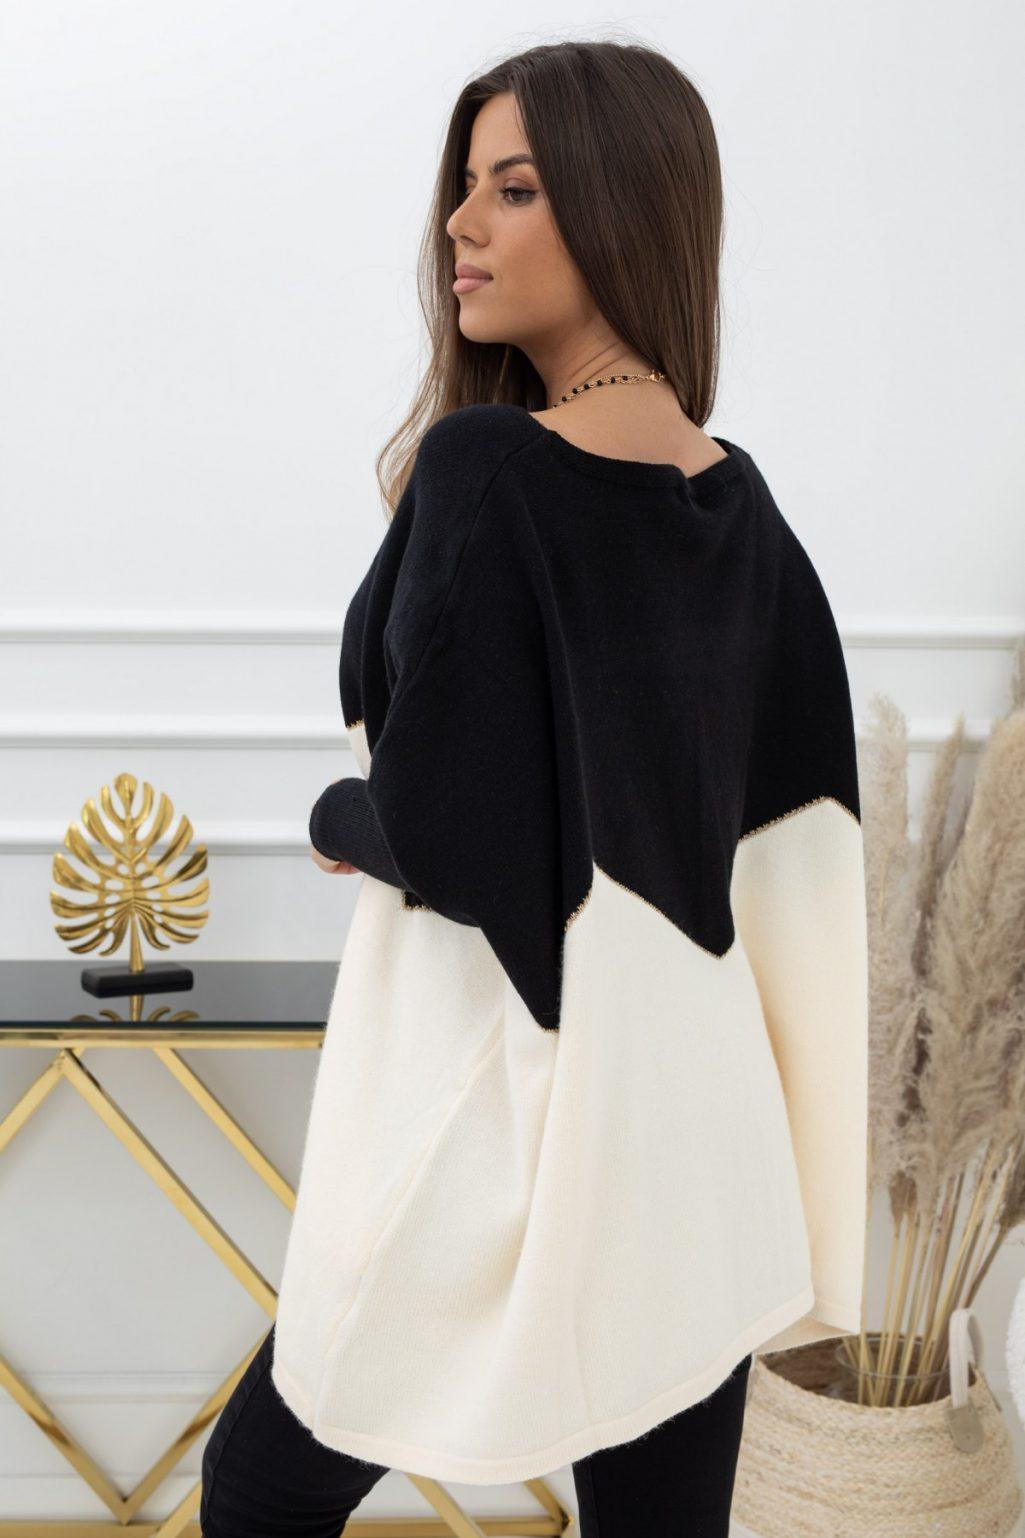 cierny sveter